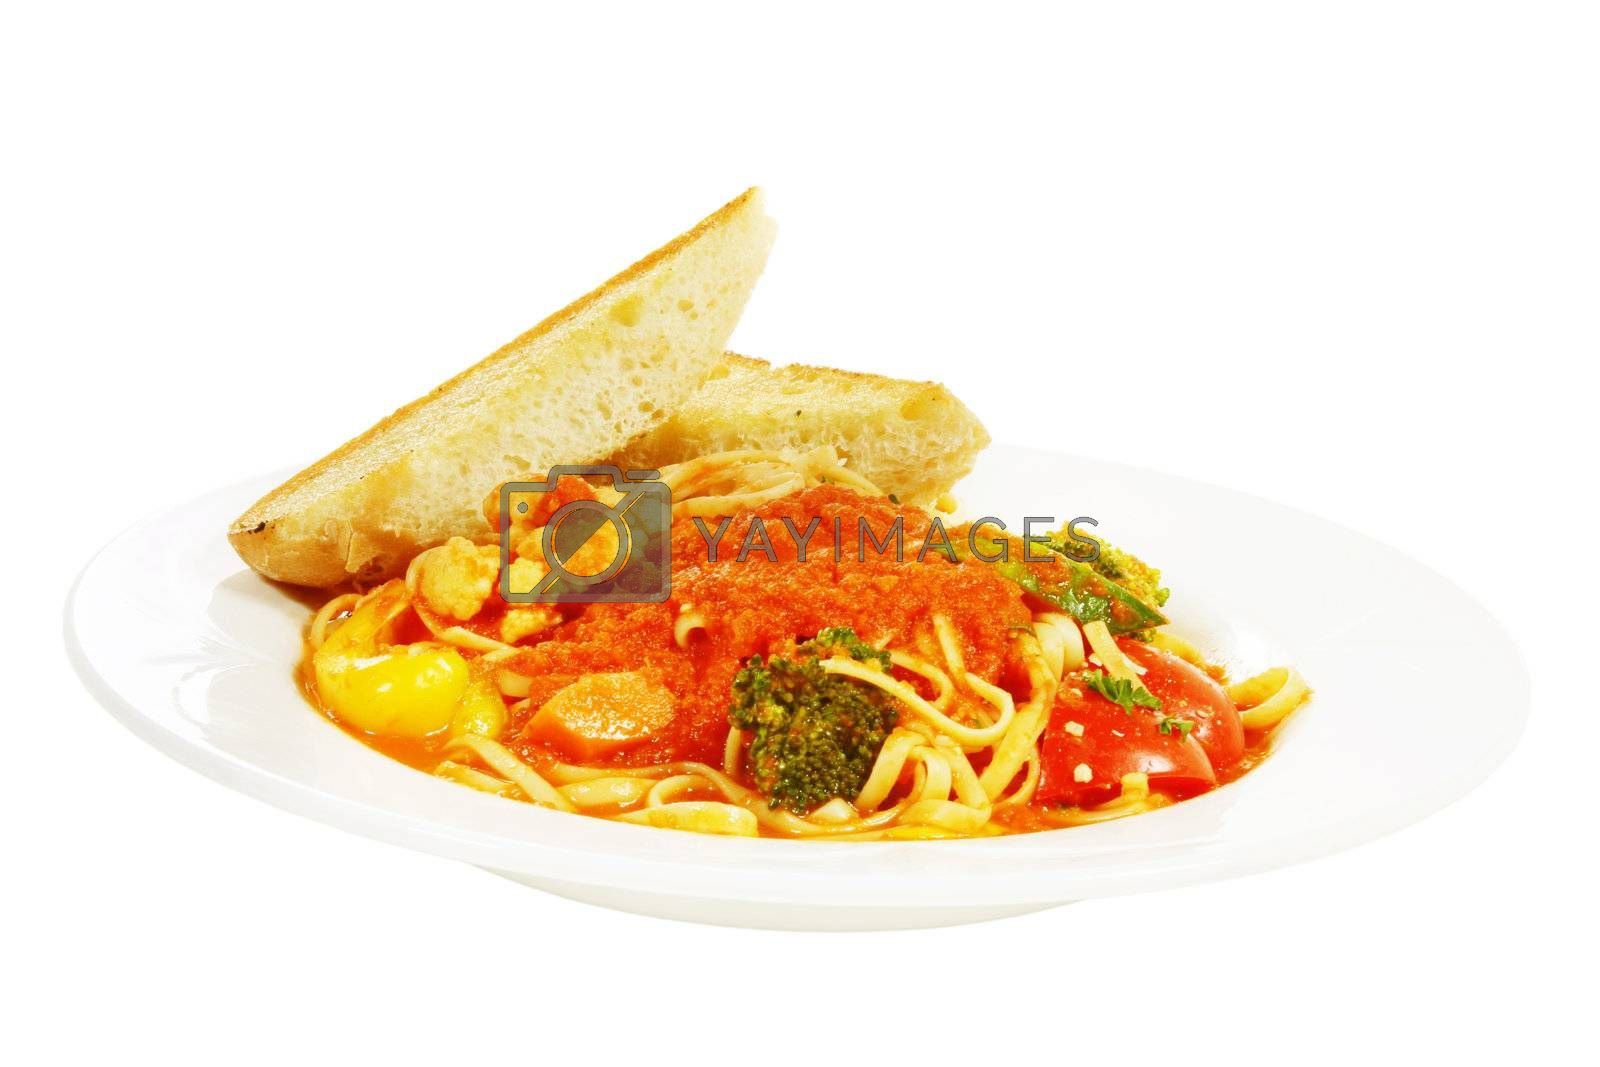 linguini pasta primavera in tomato sauce with vegetables and garlic toast